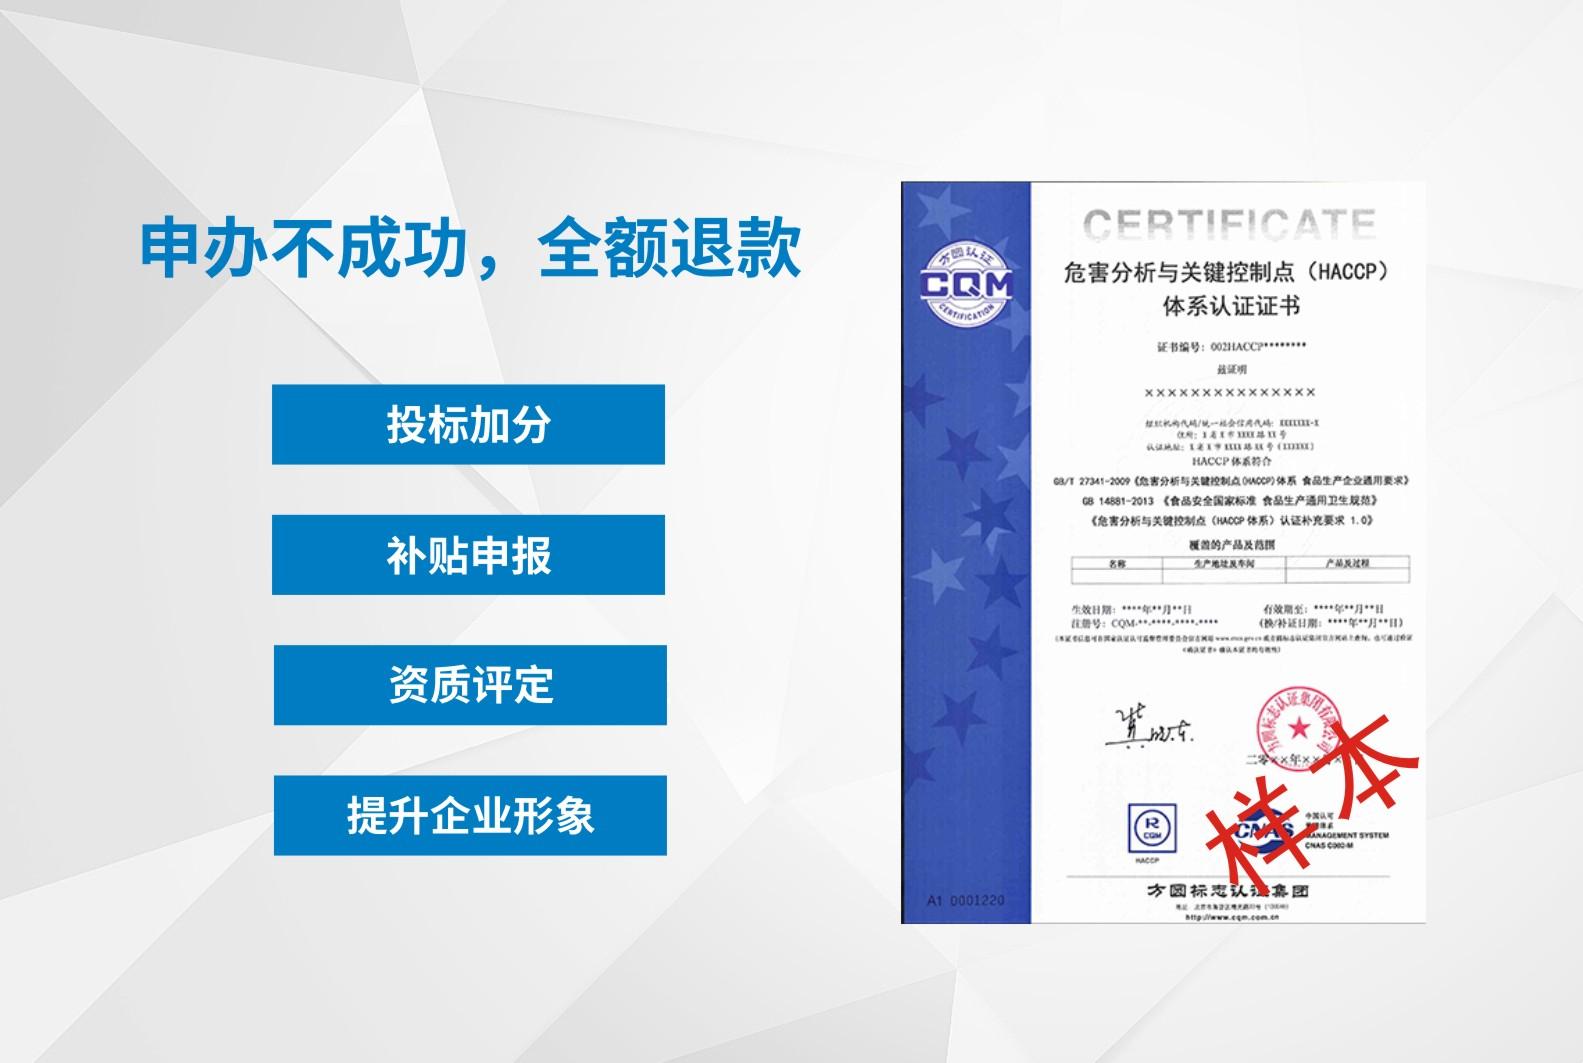 HACCP-危害分析和關鍵控制點體系